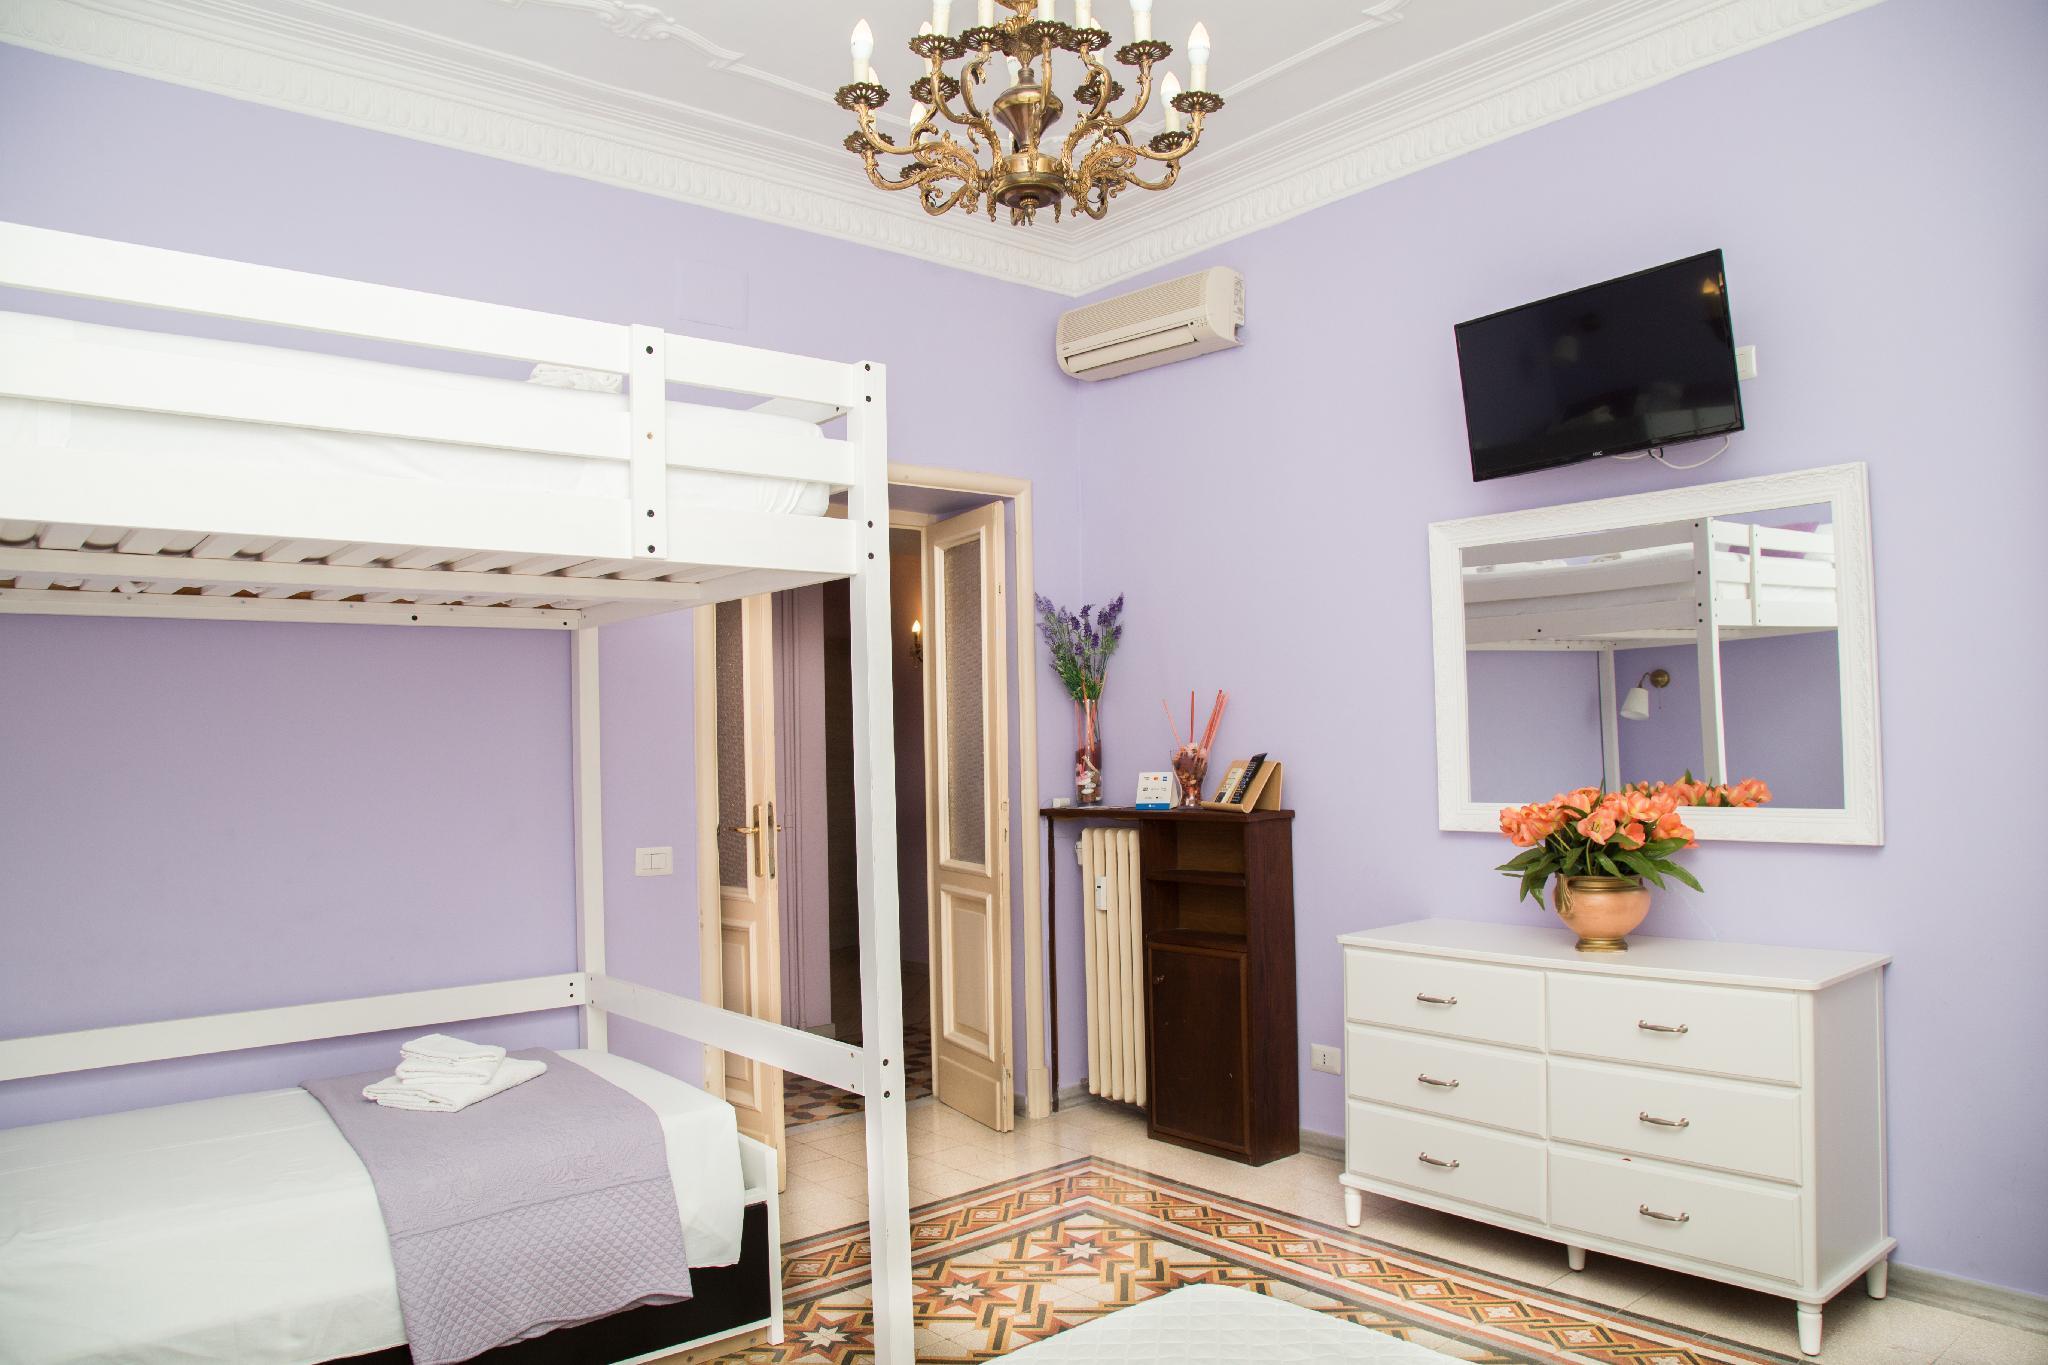 Sweet Sleep Vatican - Guest House in Rome